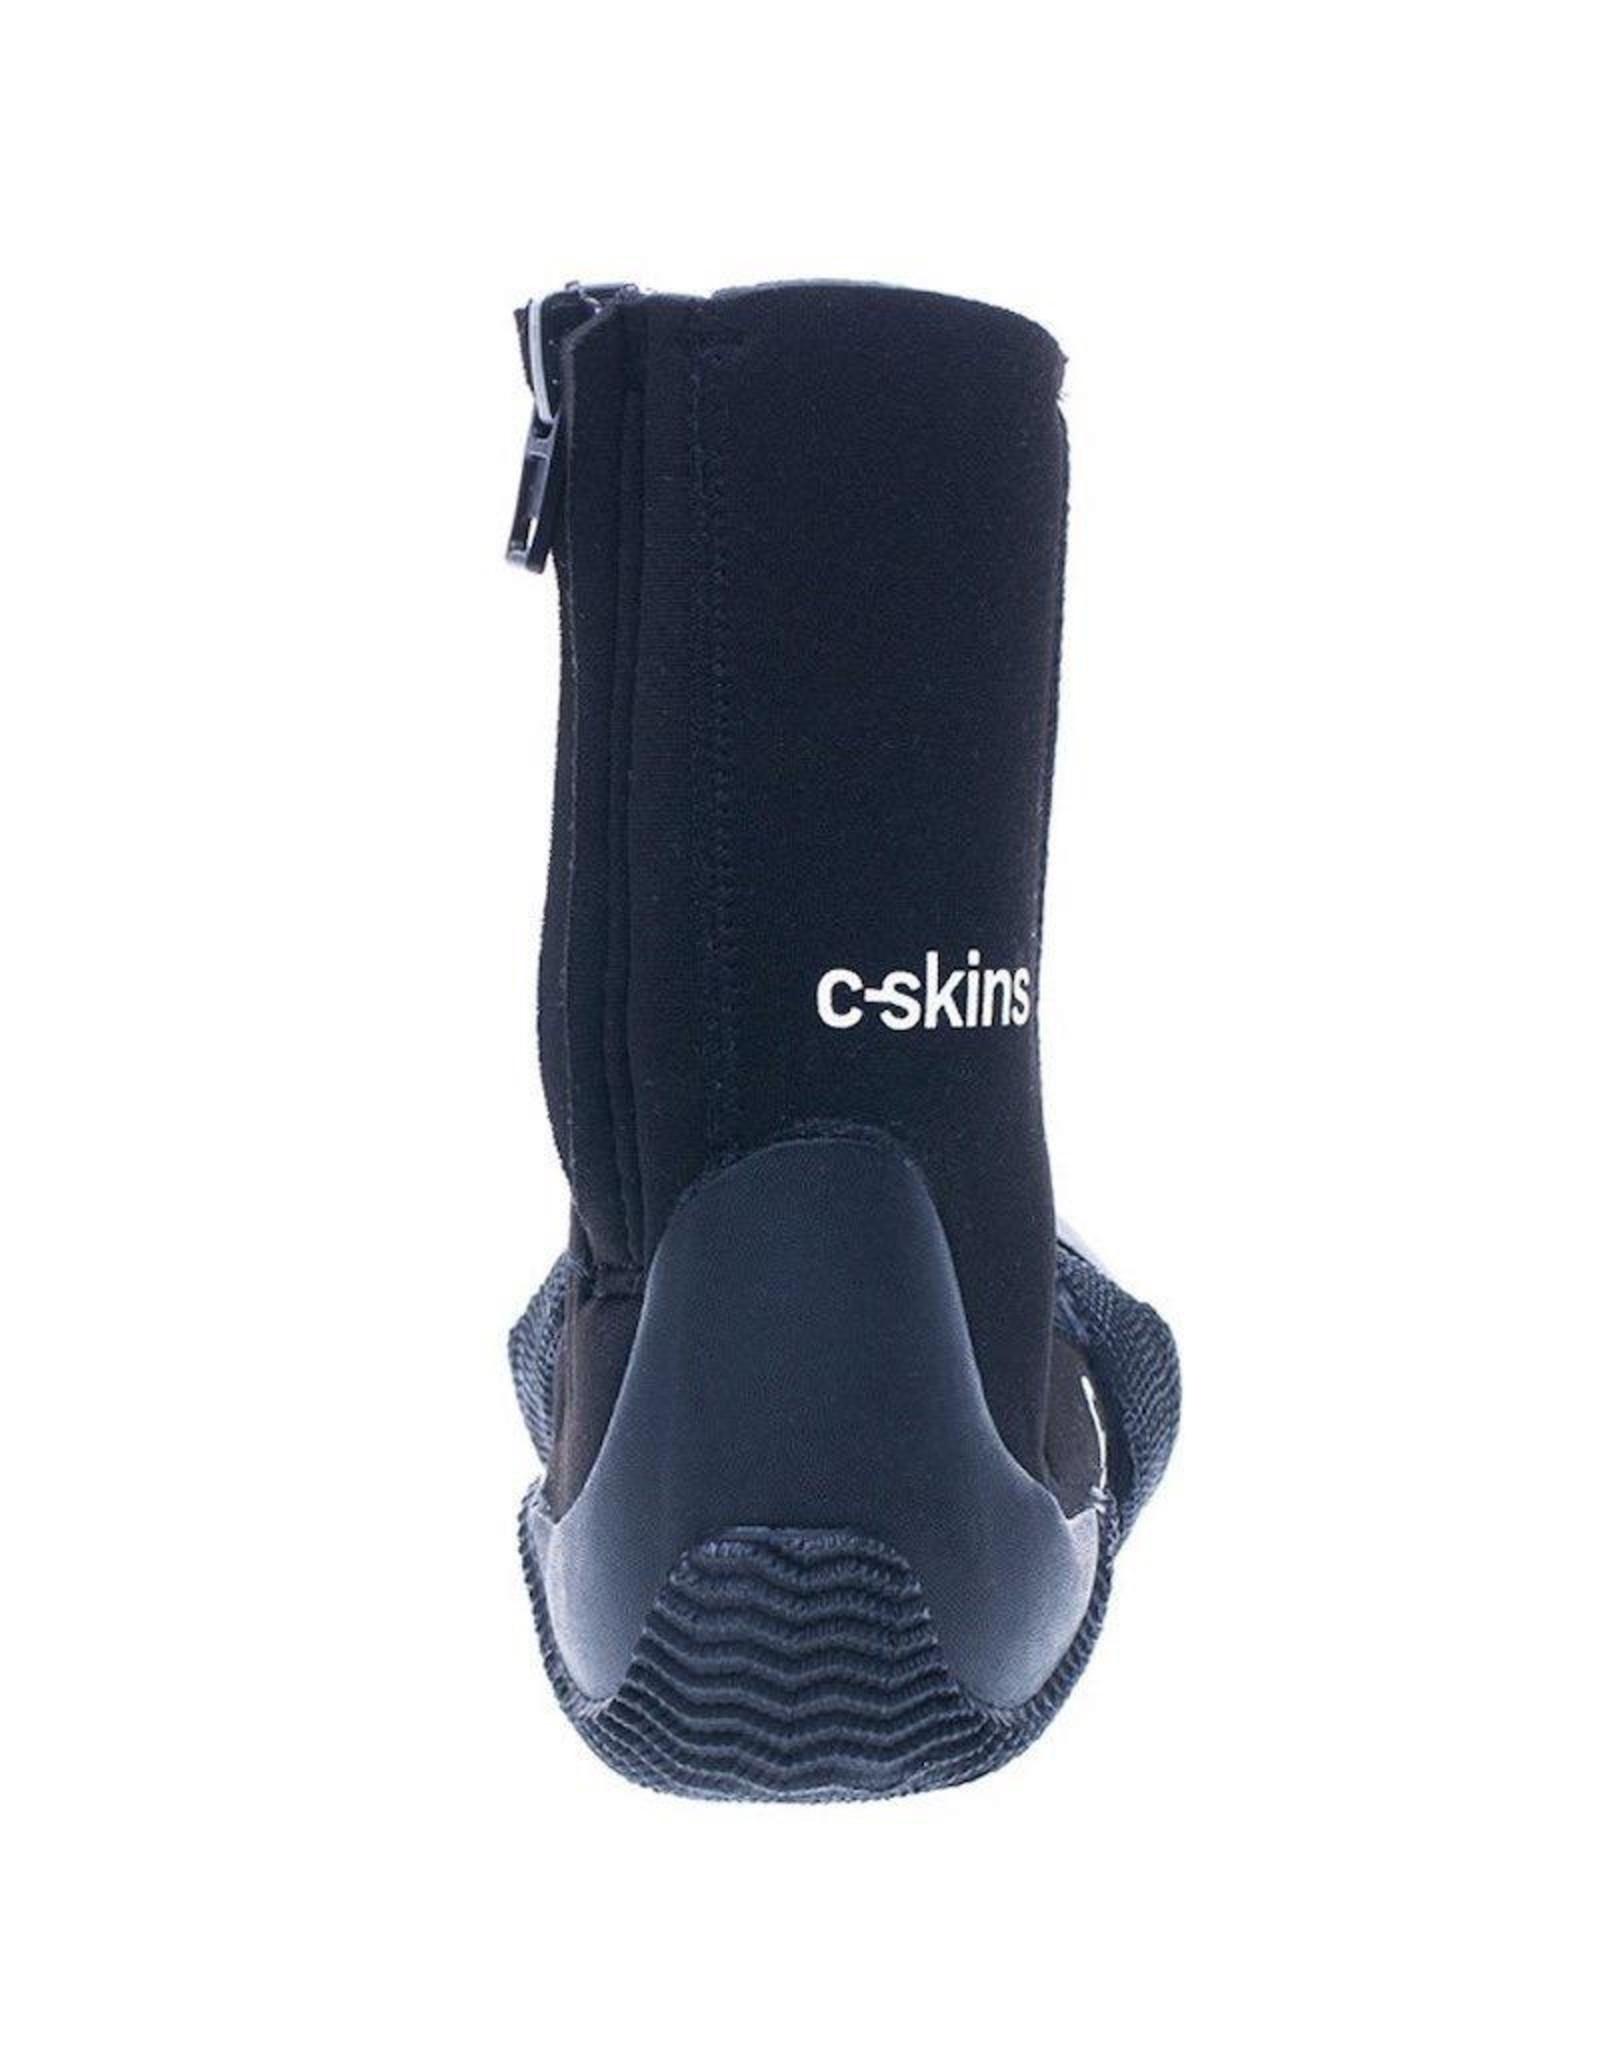 C-Skins C-Skins - Legend 5mm - 43-US10-28cm - Zipped Round Toe